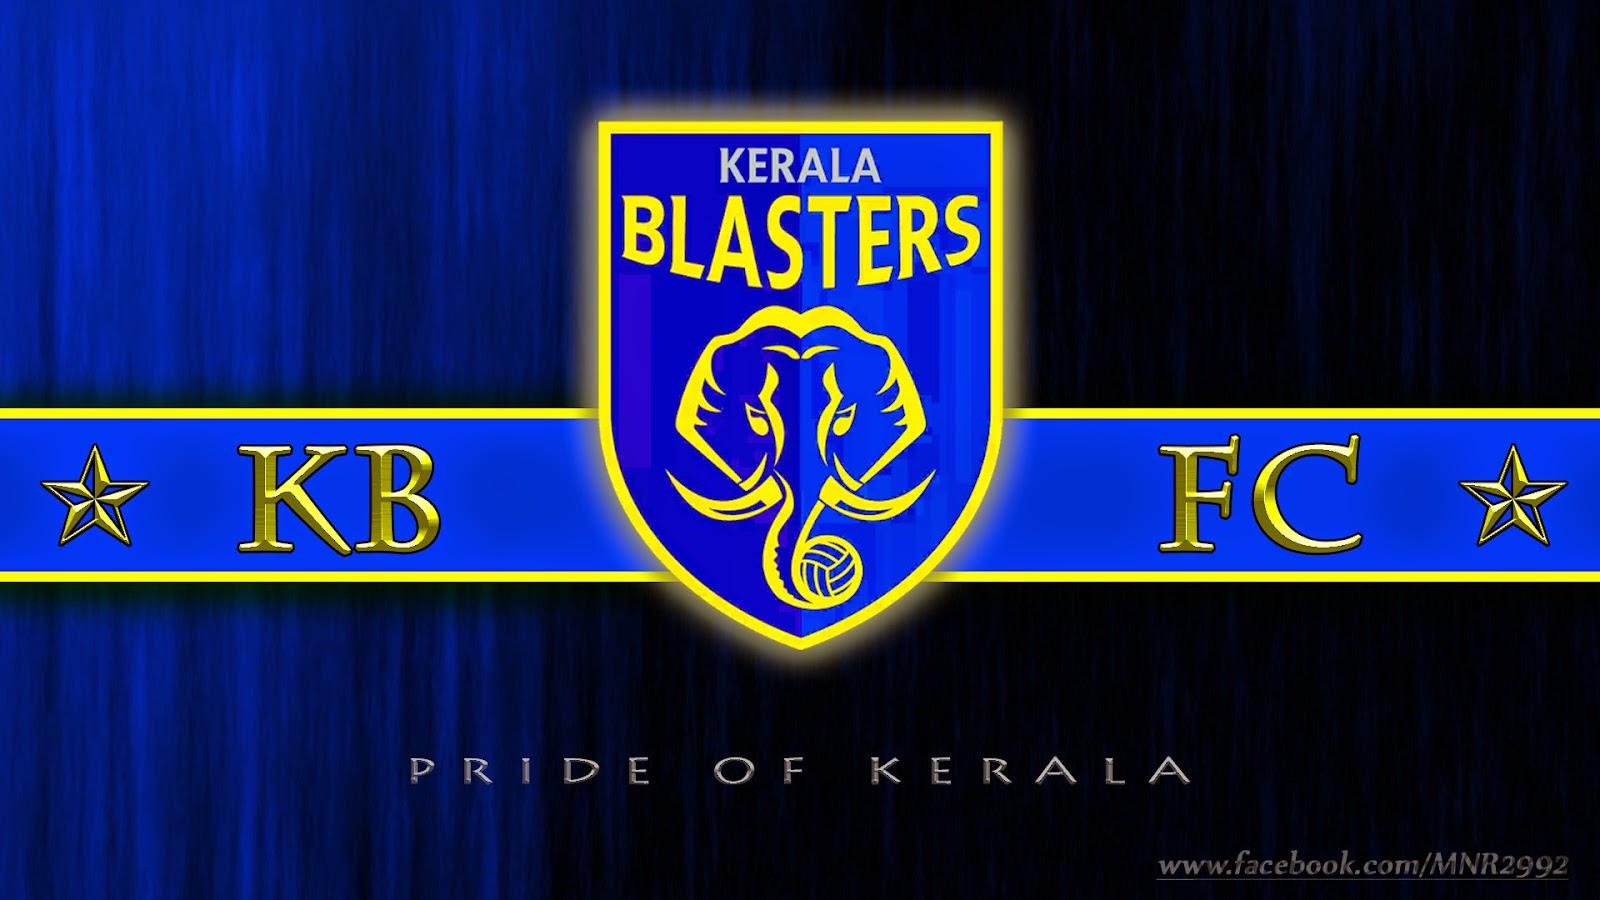 Kerala Blasters Wallpapers   Kerala Blasters Fc Wallpaper 1600x900